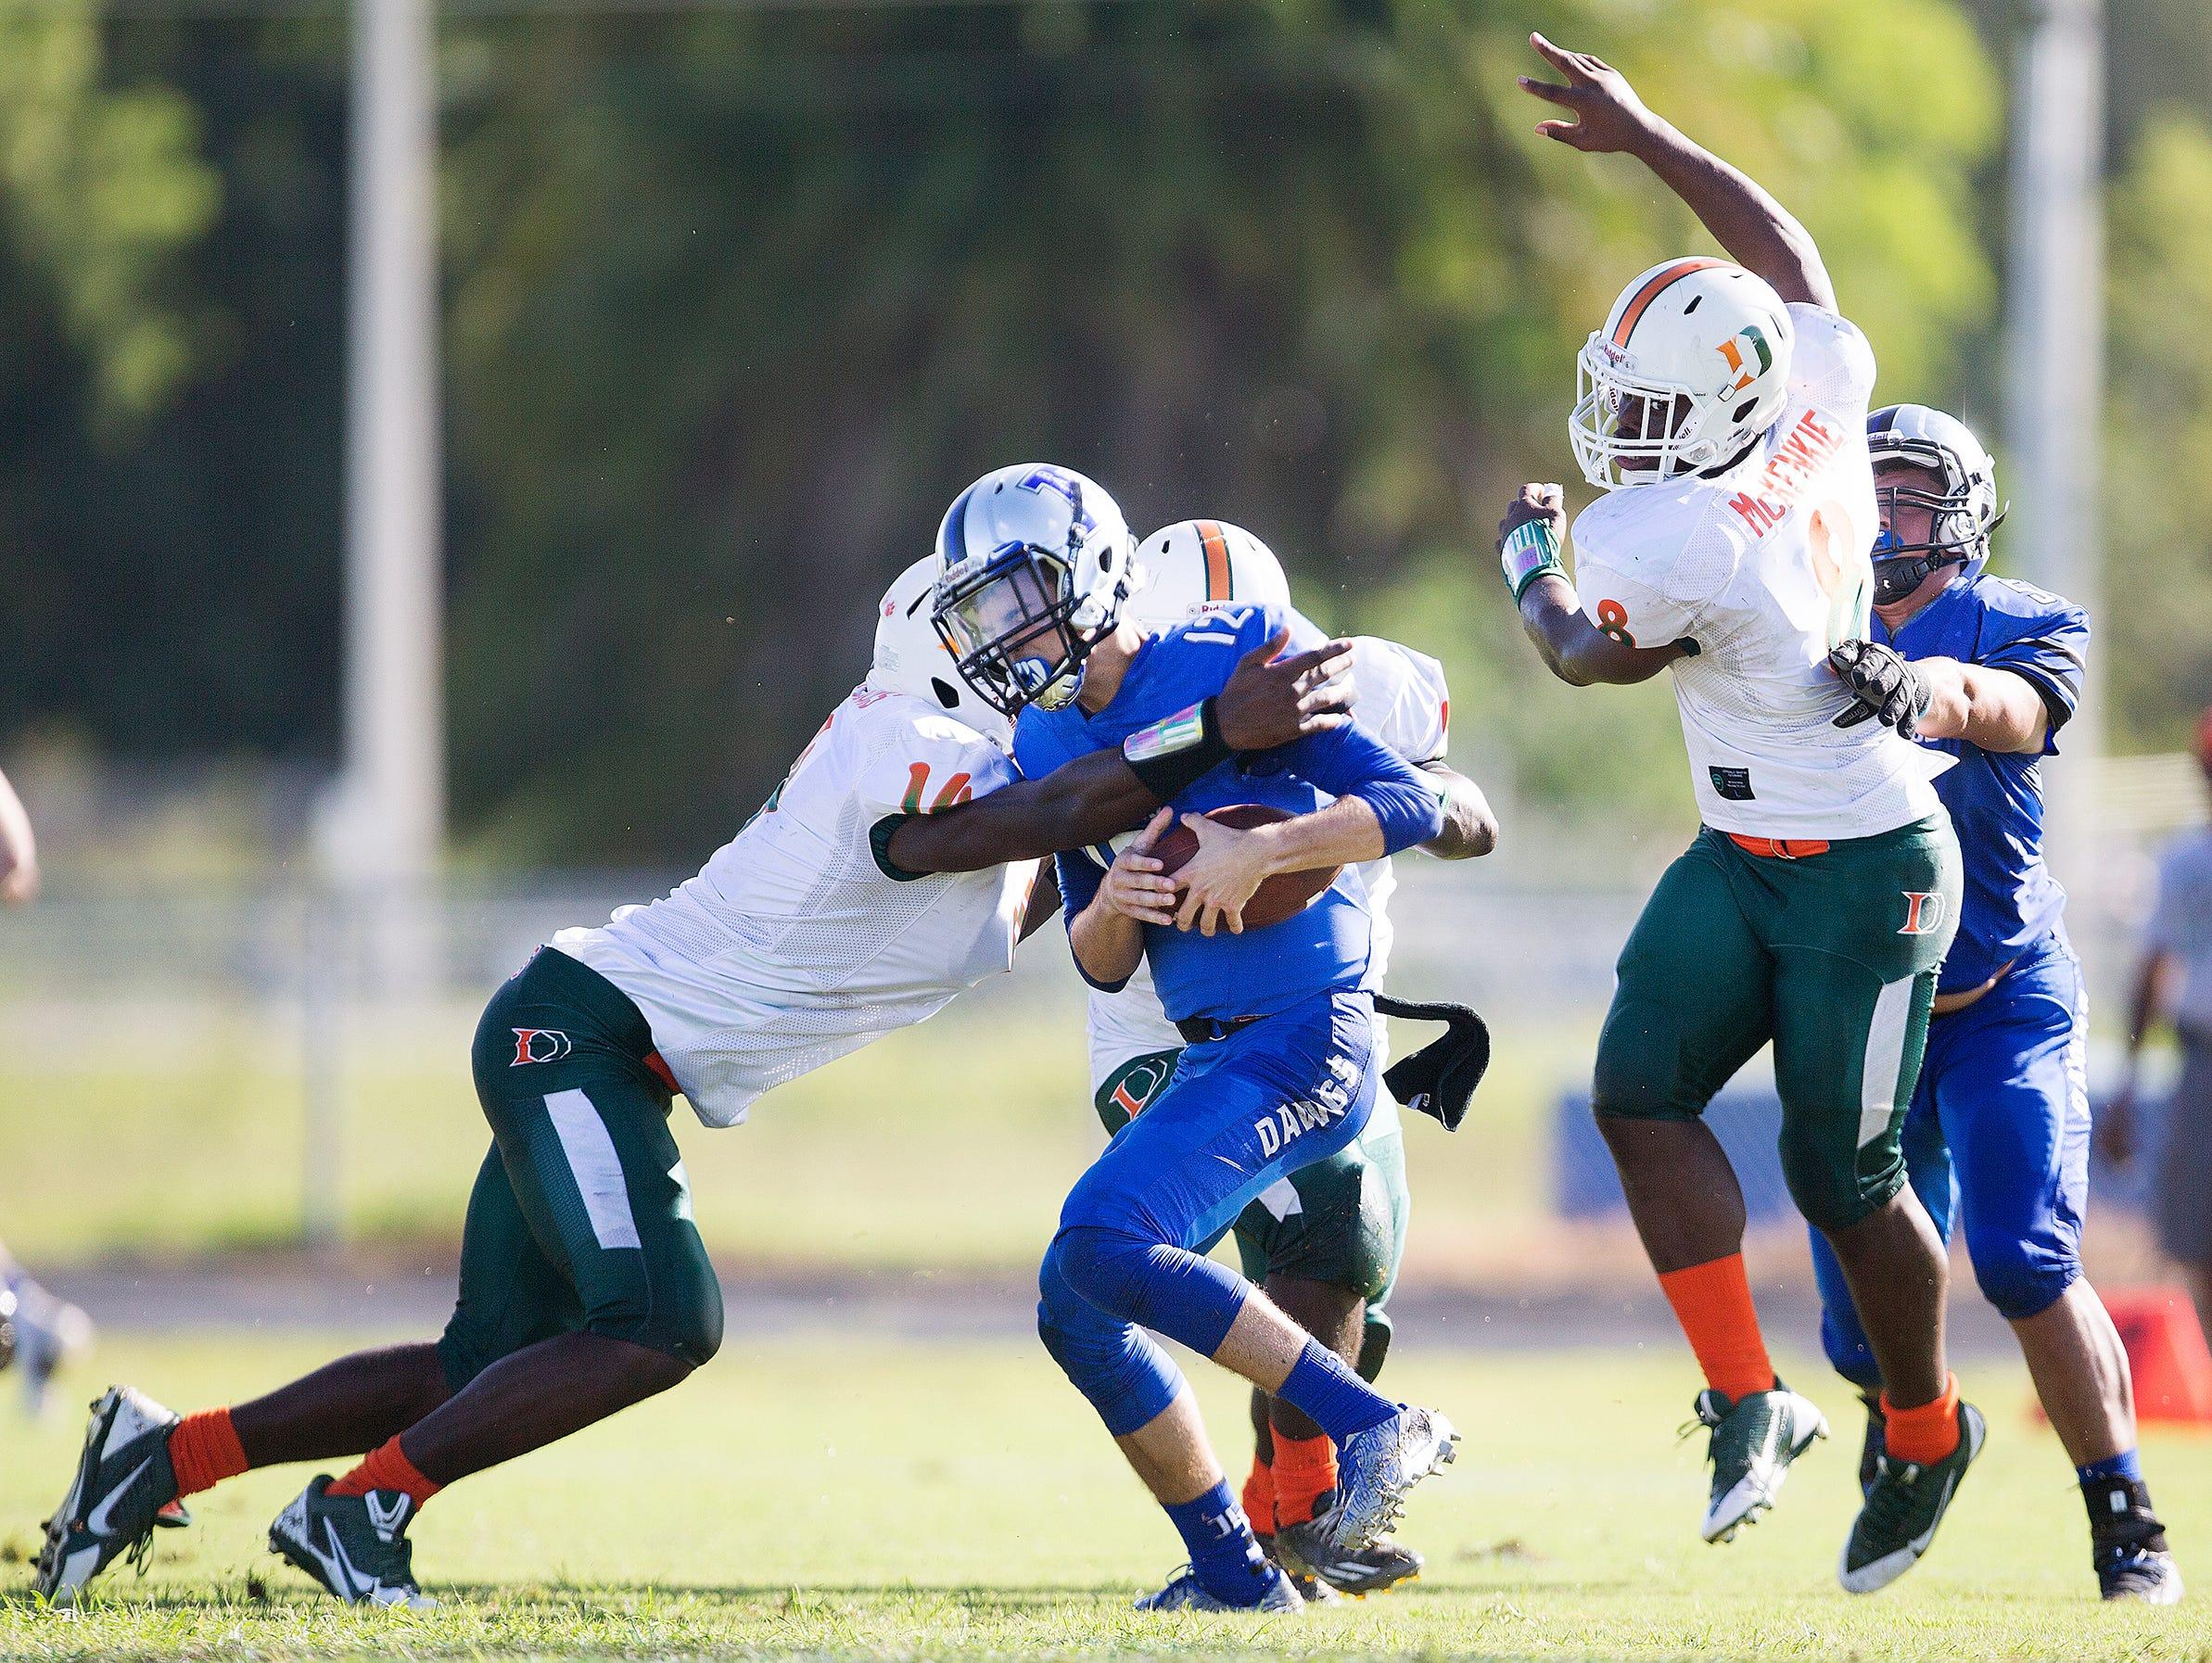 Dunbar High School's Rocky Jacques-louis sacks Ida Baker High School's Toby Noland during first quarter play Saturday at Ida Baker High School in Cape Coral.